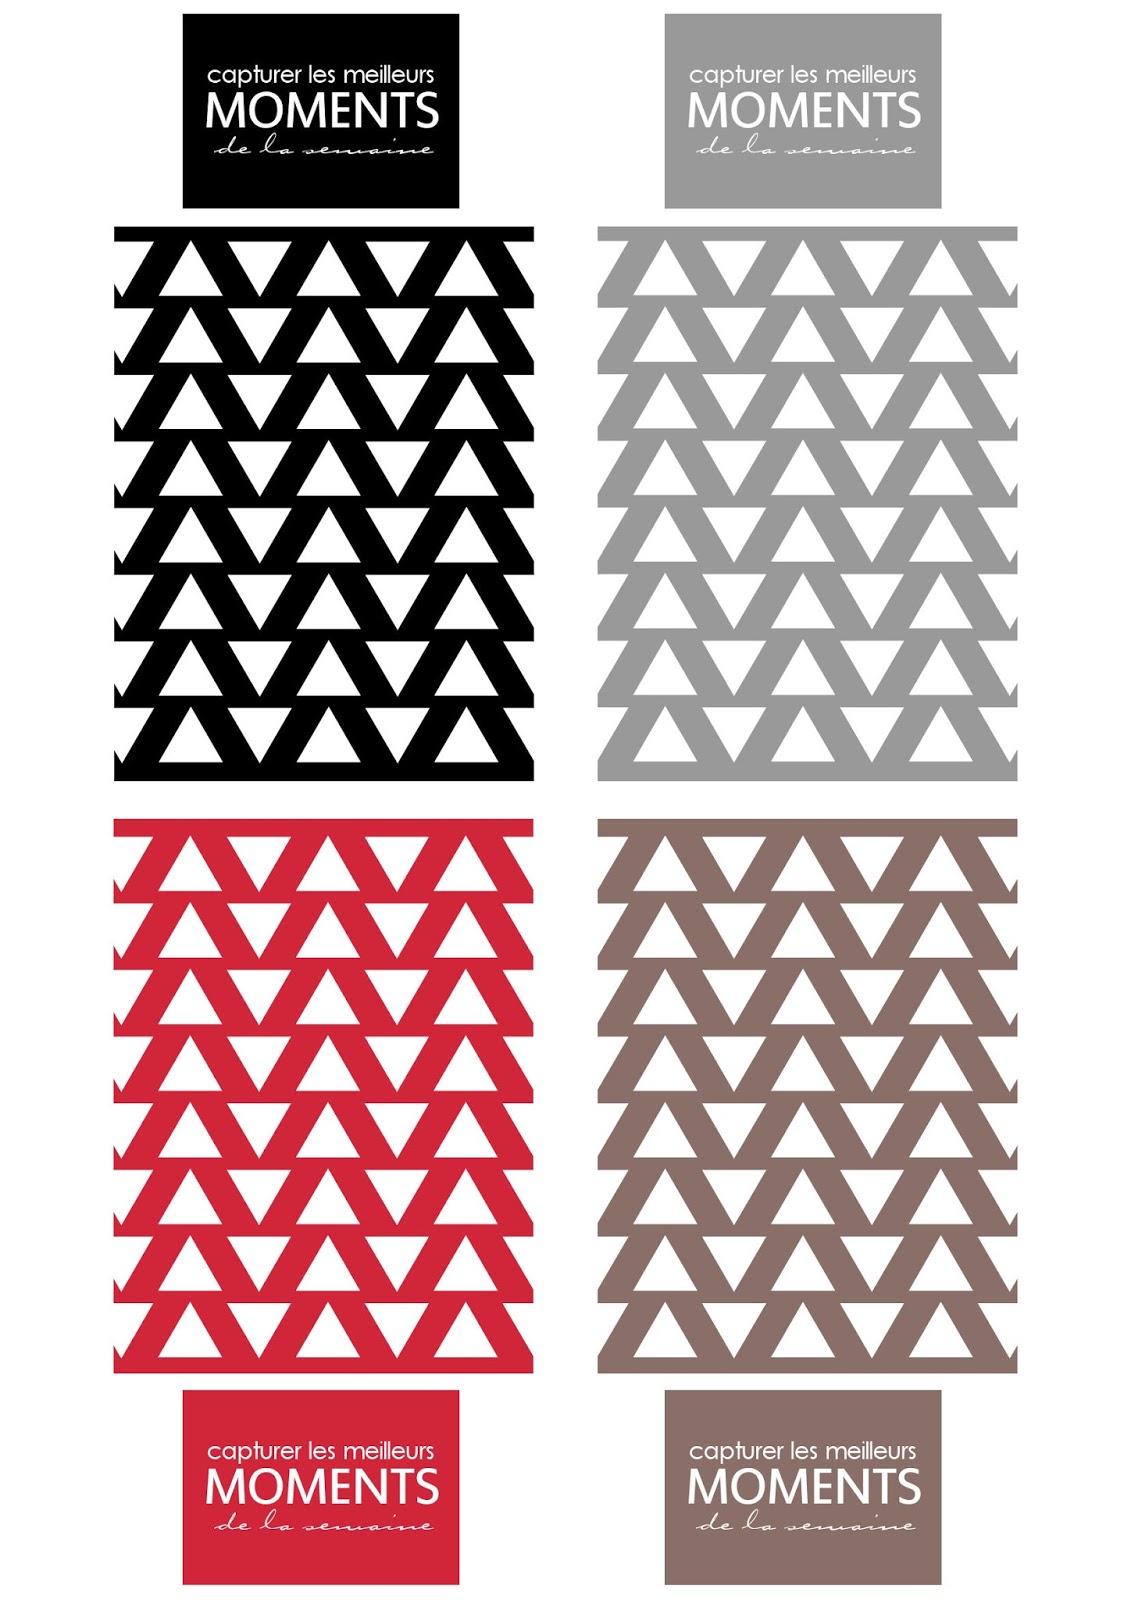 http://2.bp.blogspot.com/-HfQLb3W4Pp0/UxcVYp-aVqI/AAAAAAAALTw/jDhcE-HeV7g/s1600/Etiquettes-Triangle-Mars2014.jpg